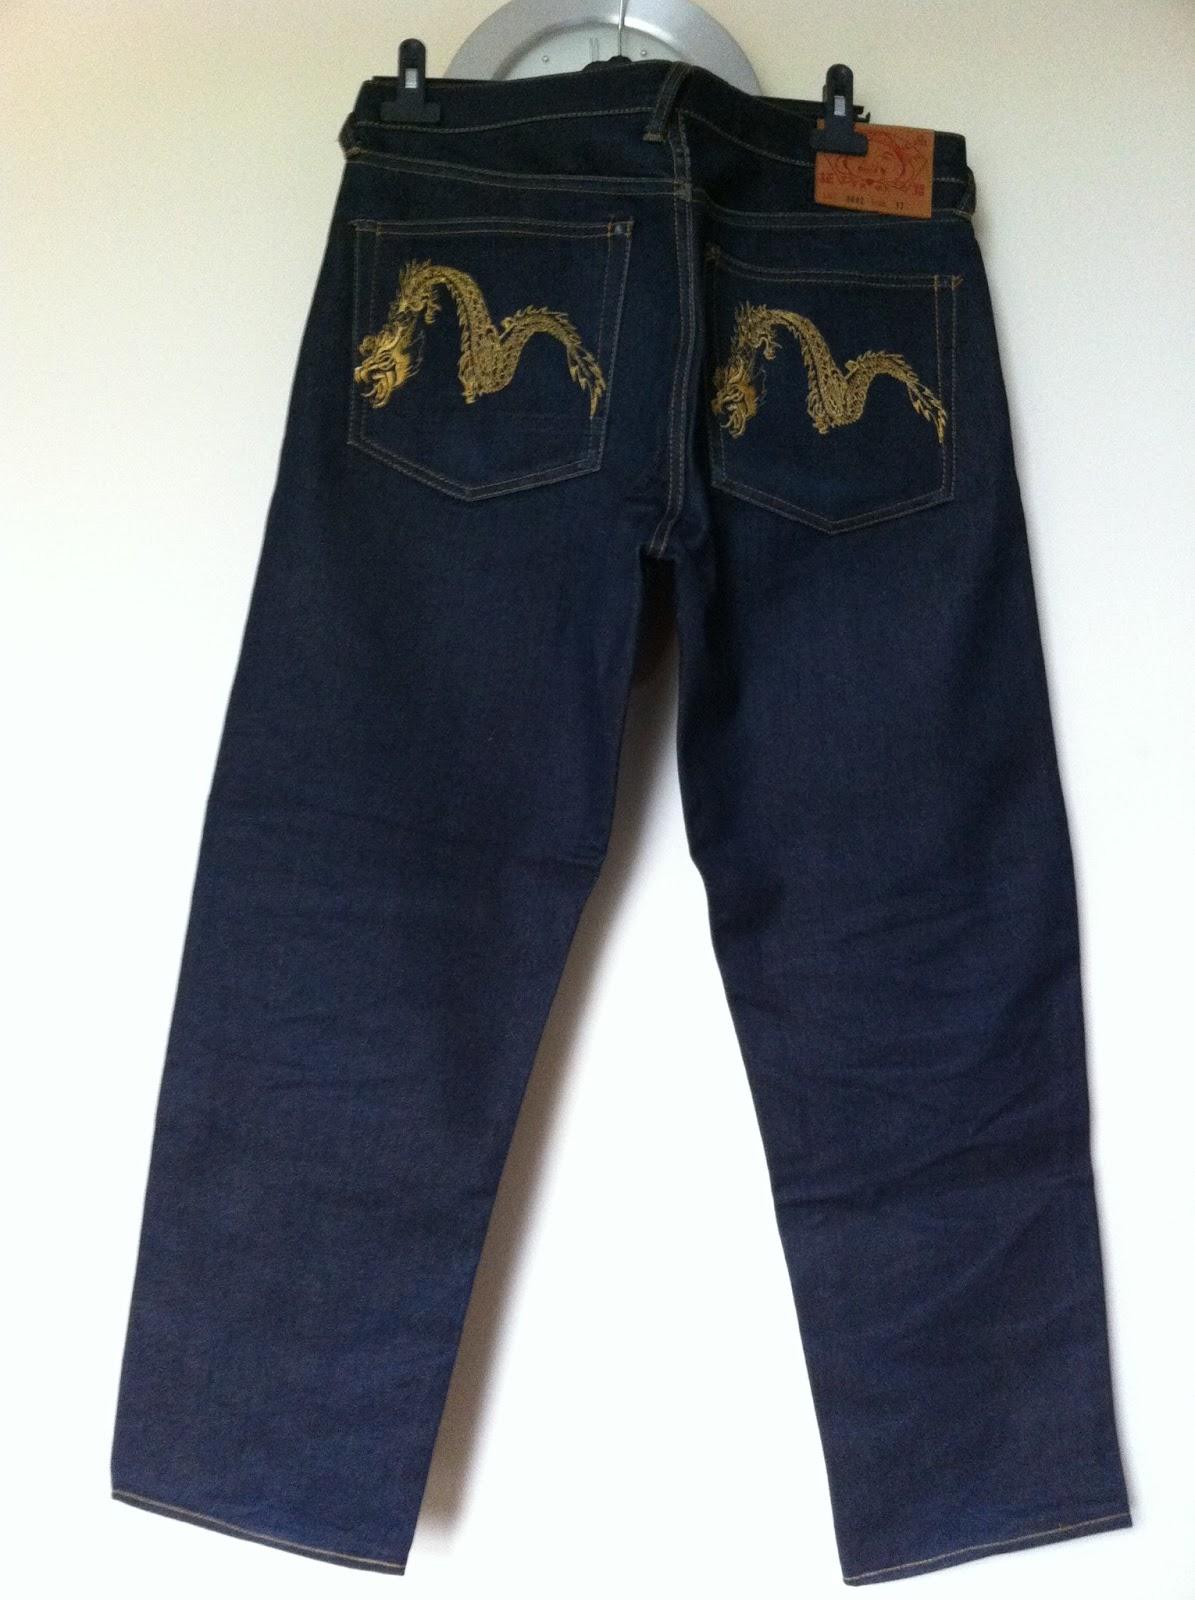 azim wiganuk bundle evisu jeans gold dragon size 32